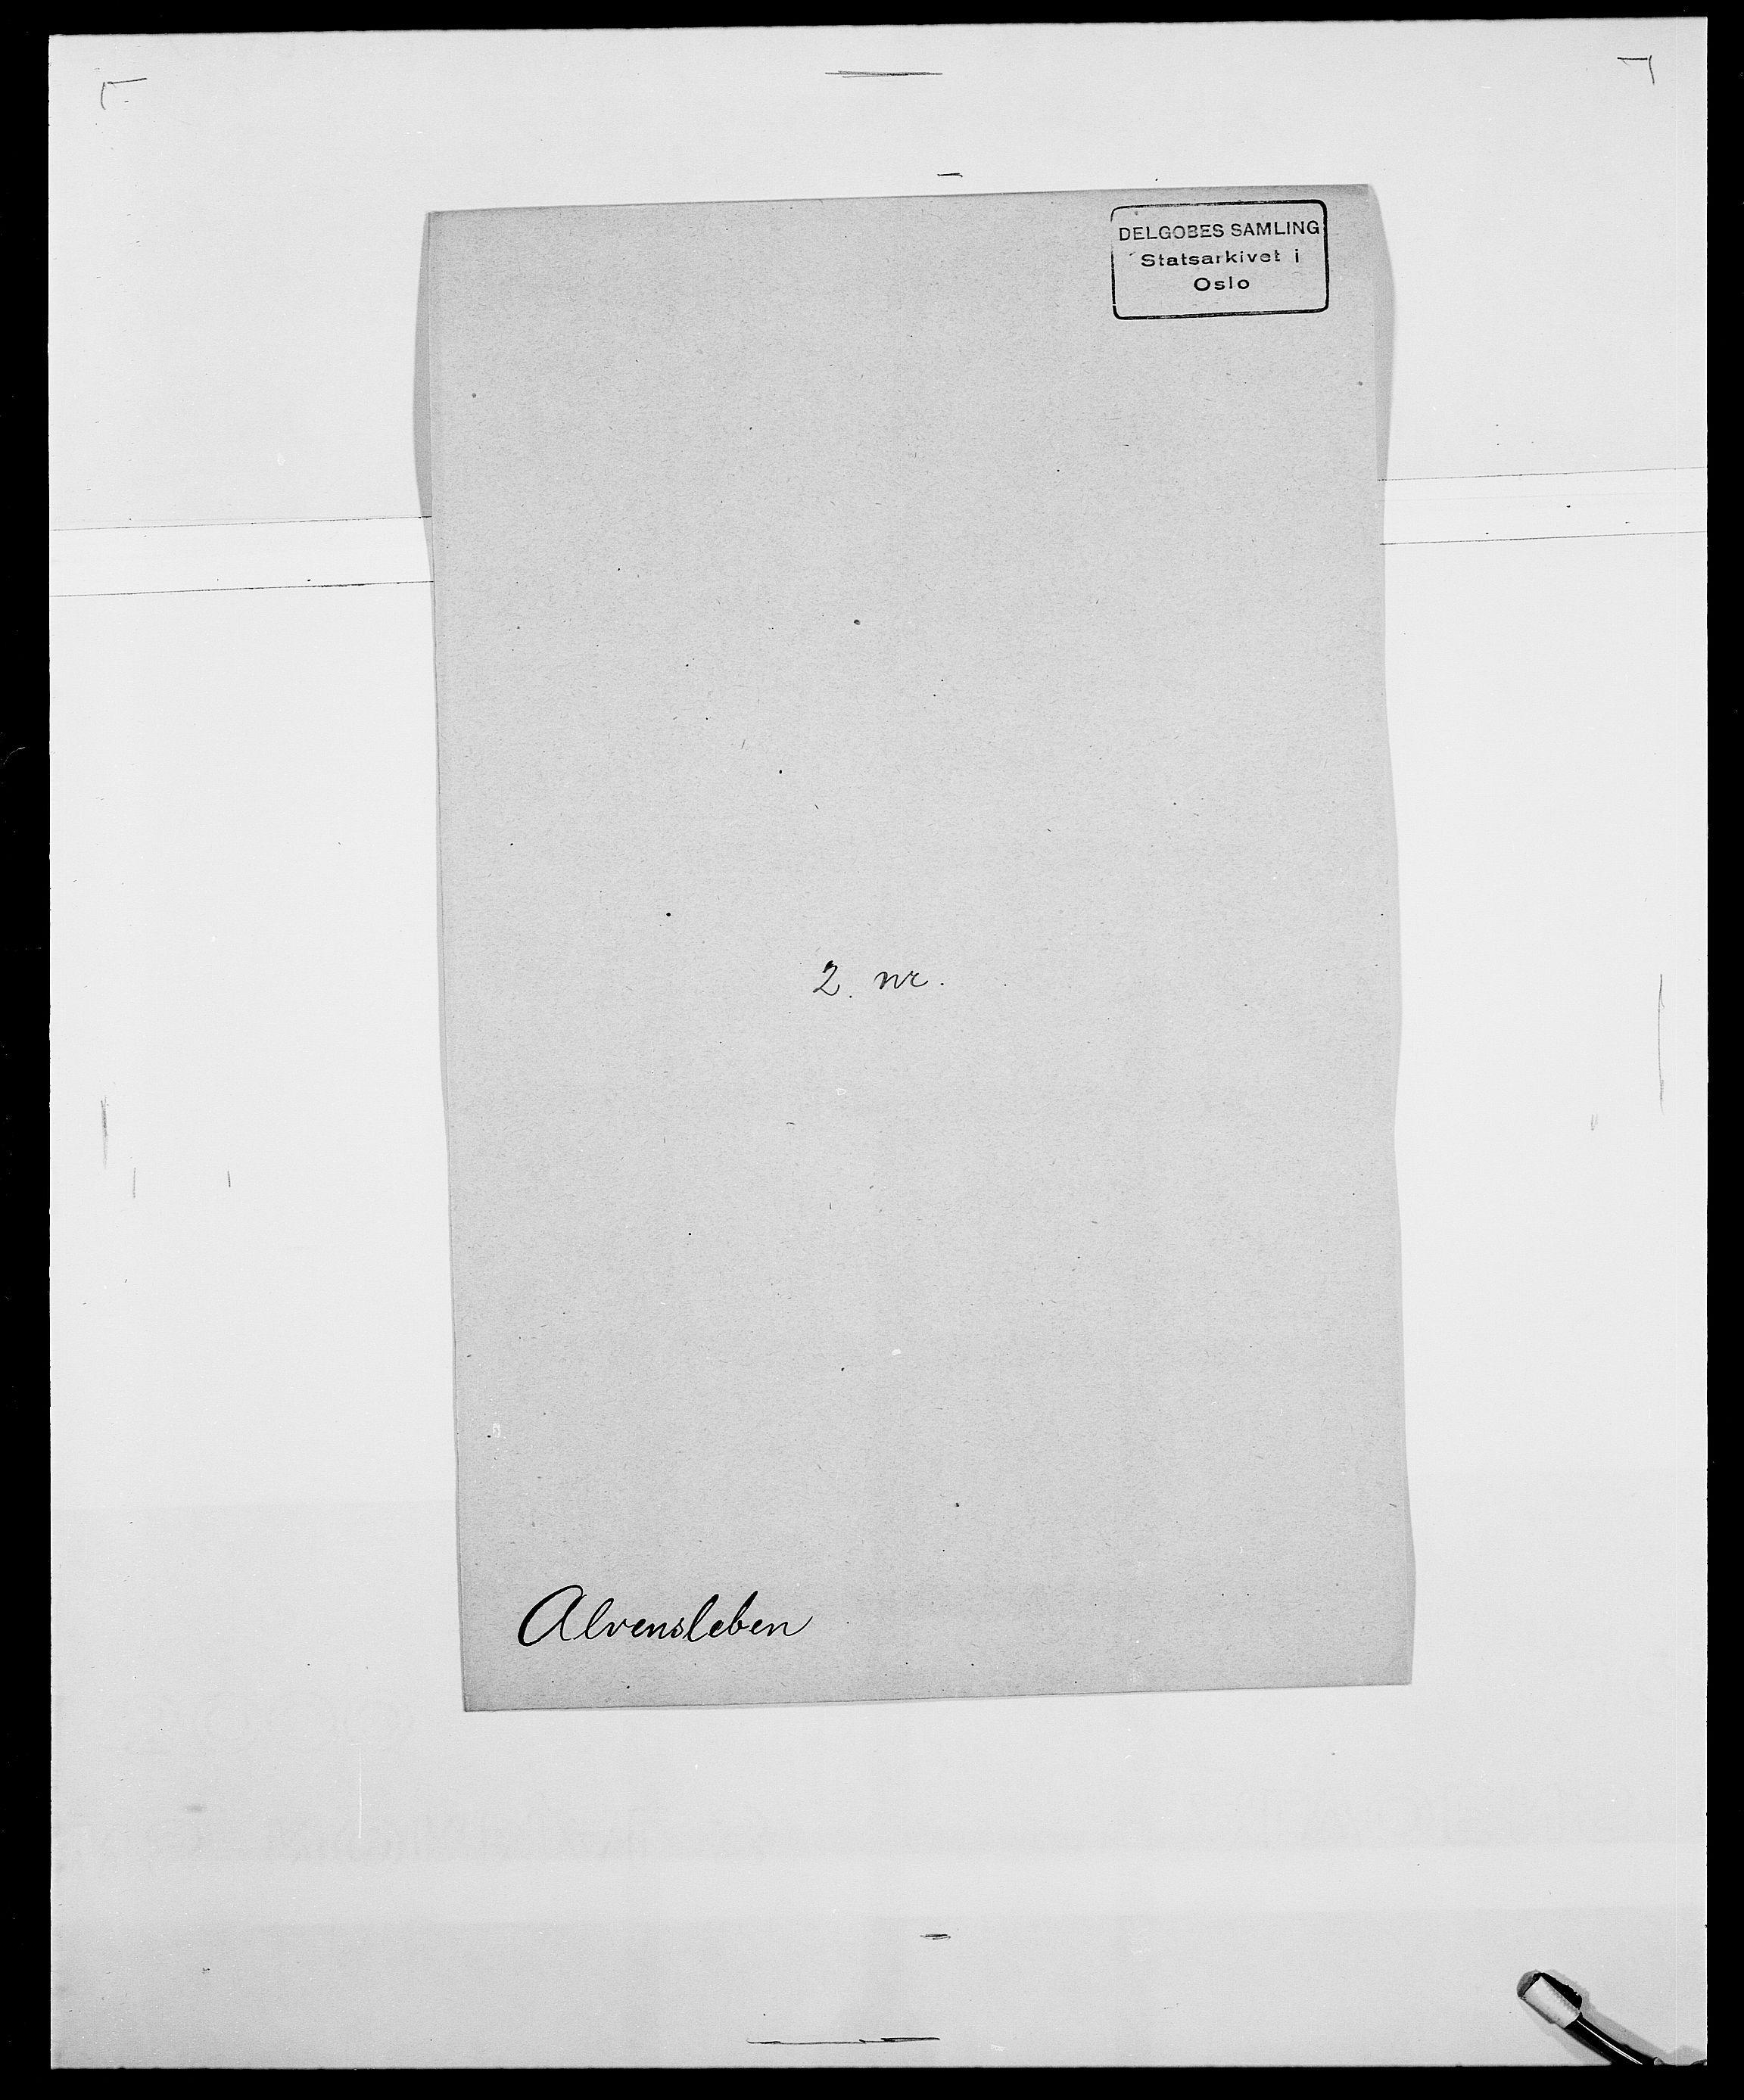 SAO, Delgobe, Charles Antoine - samling, D/Da/L0001: Aabye - Angerman, s. 503